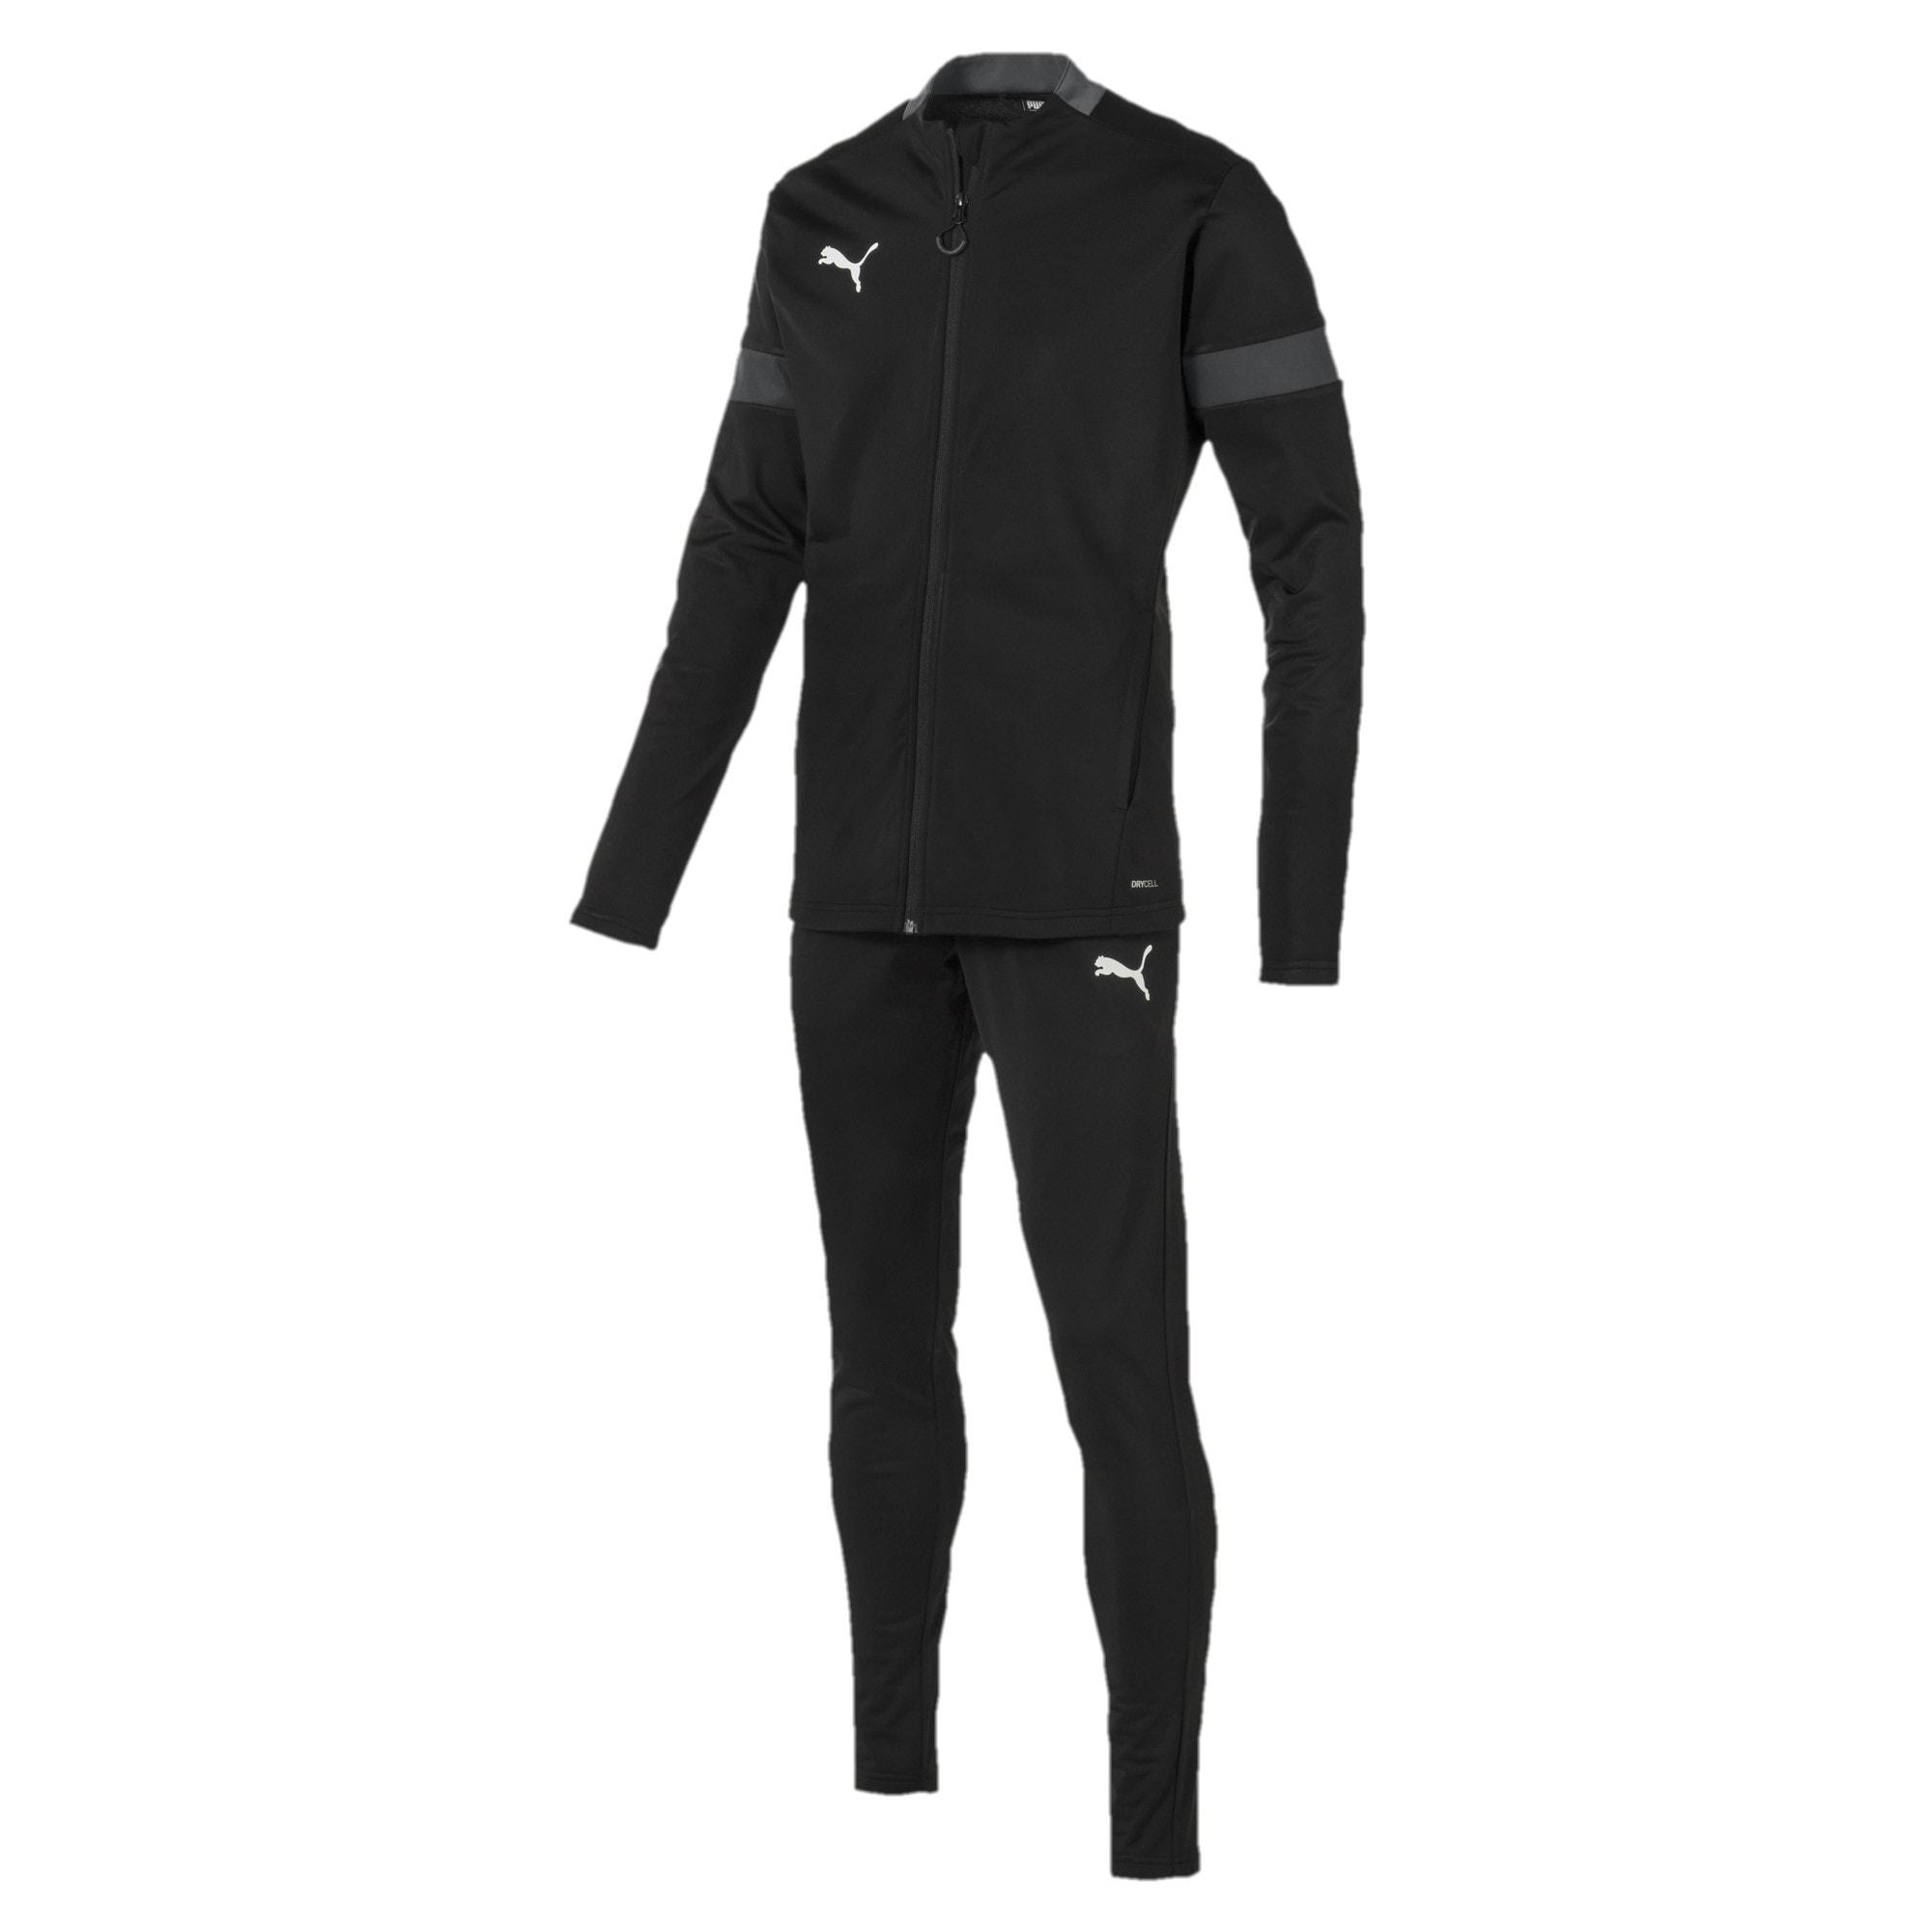 Trainingsanzug | Sportbekleidung > Sportanzüge > Trainingsanzüge | Graphit - Schwarz | Puma